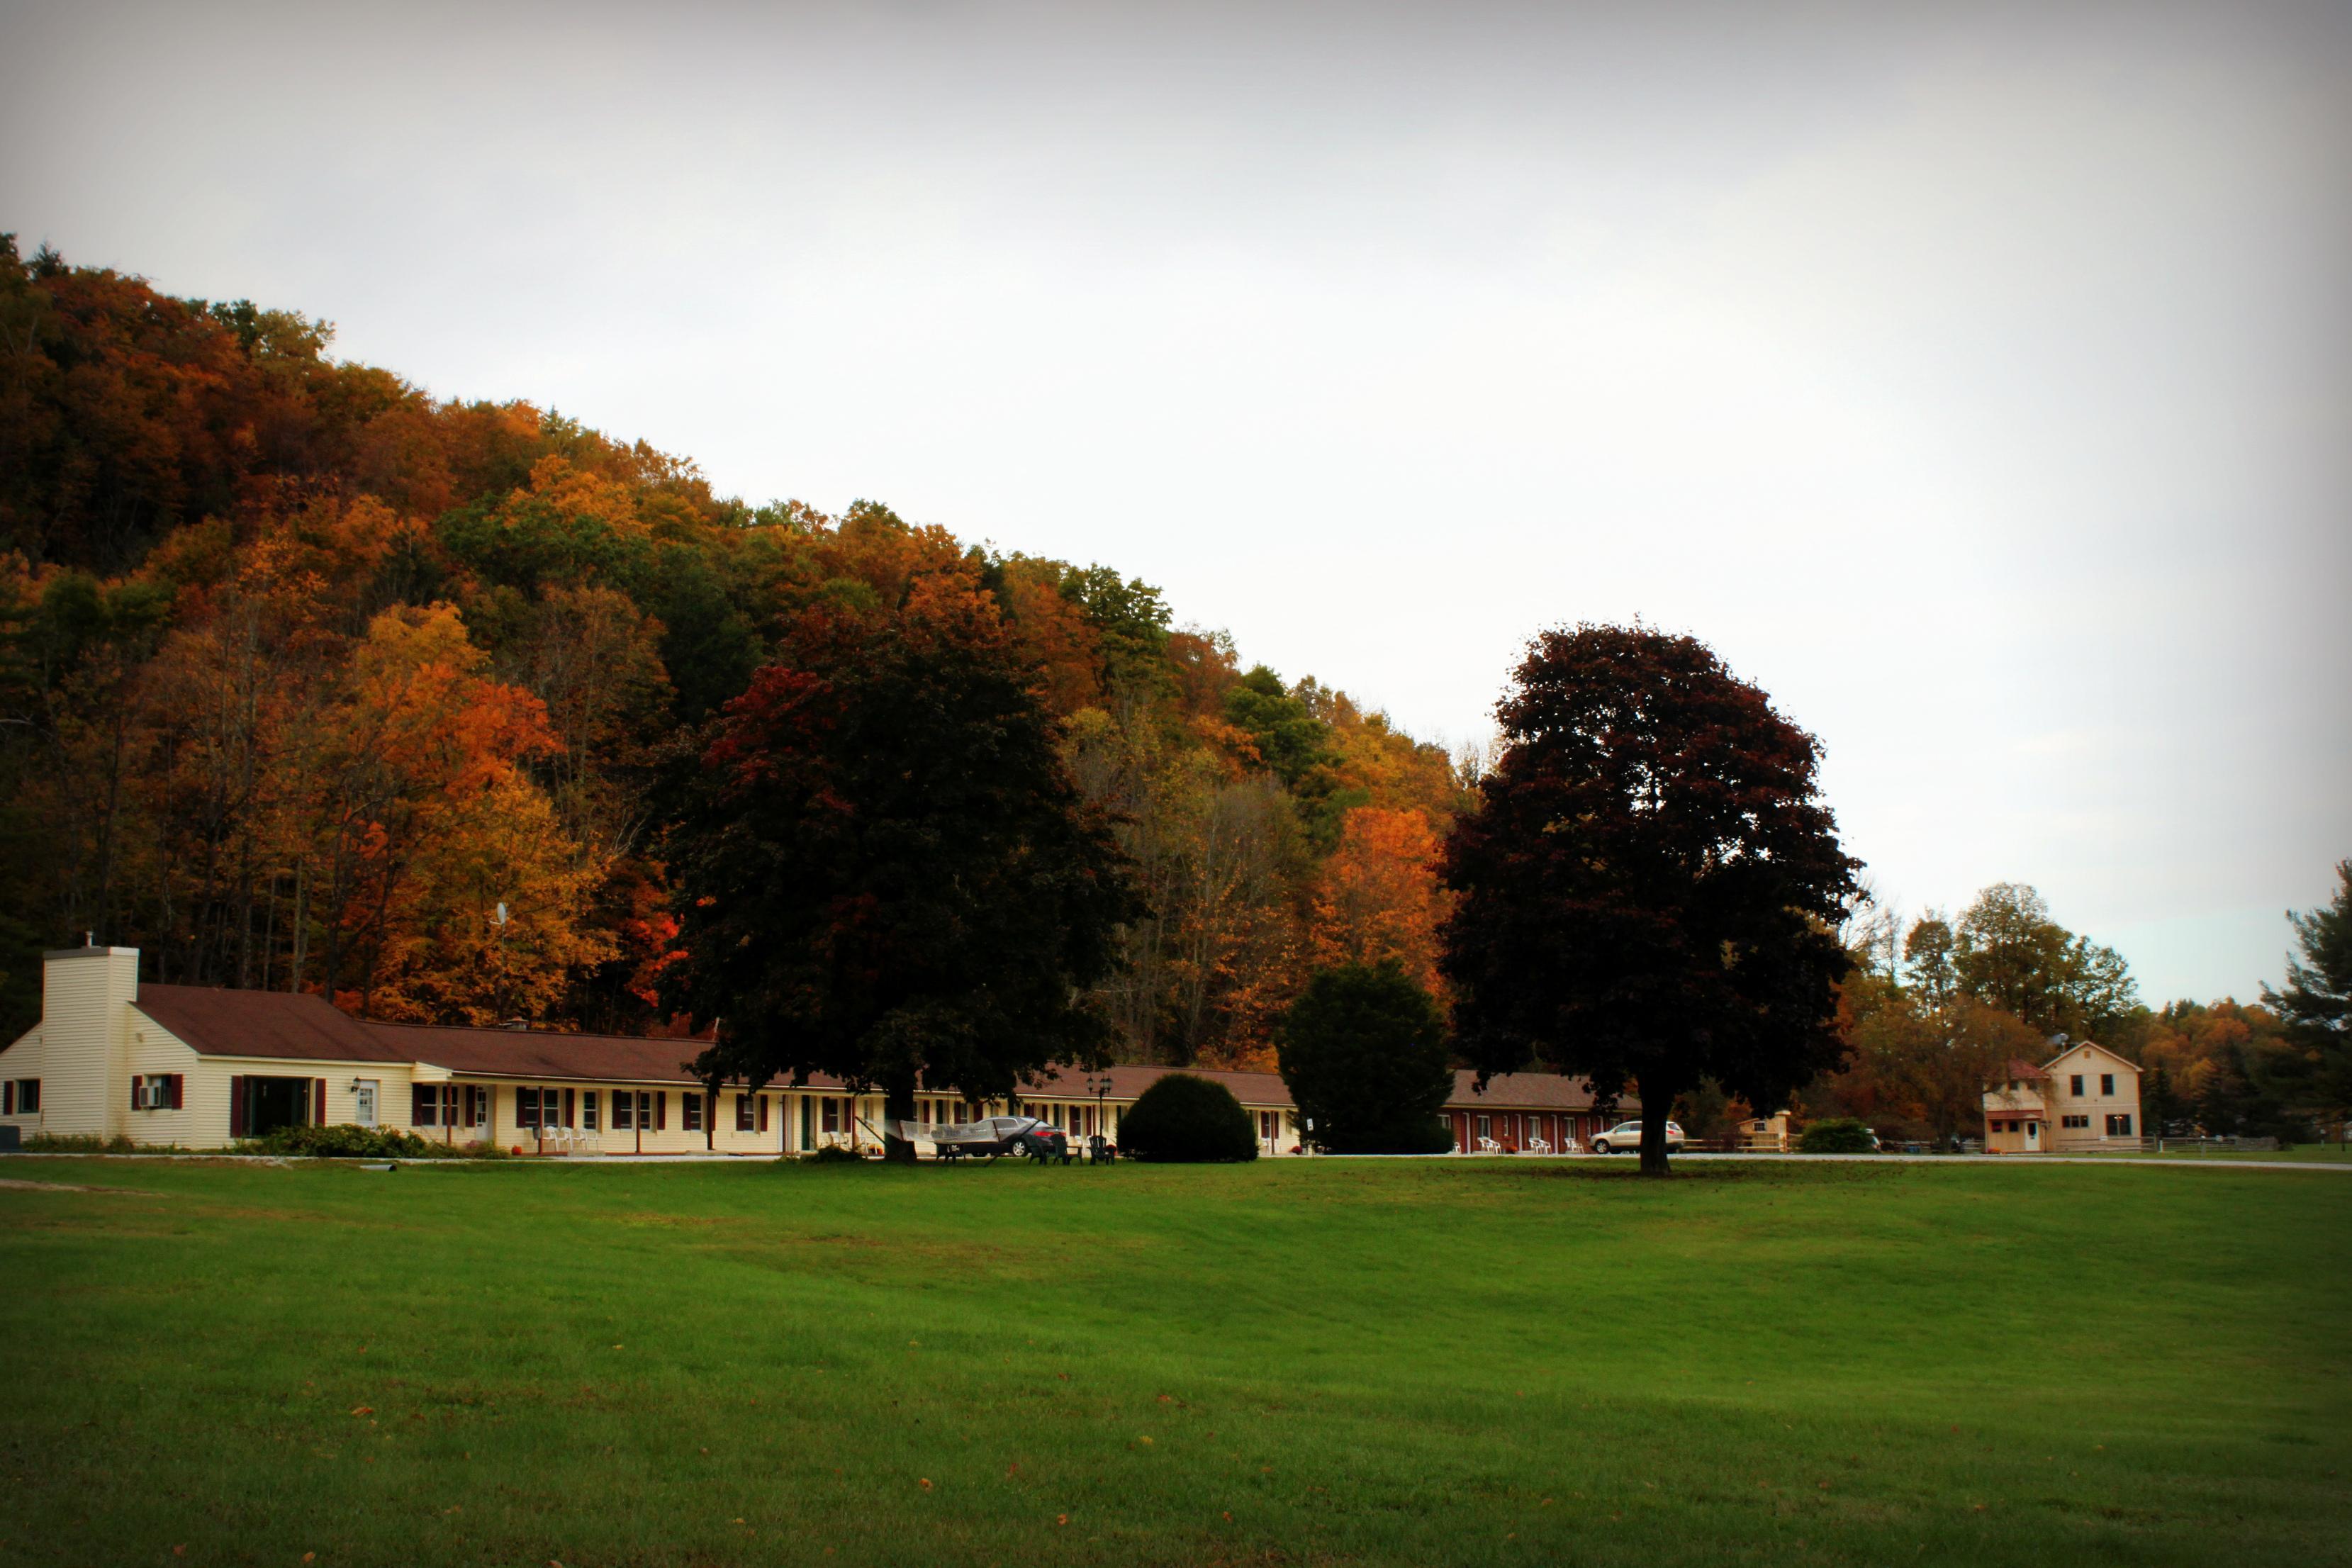 Brandon Motor Lodge